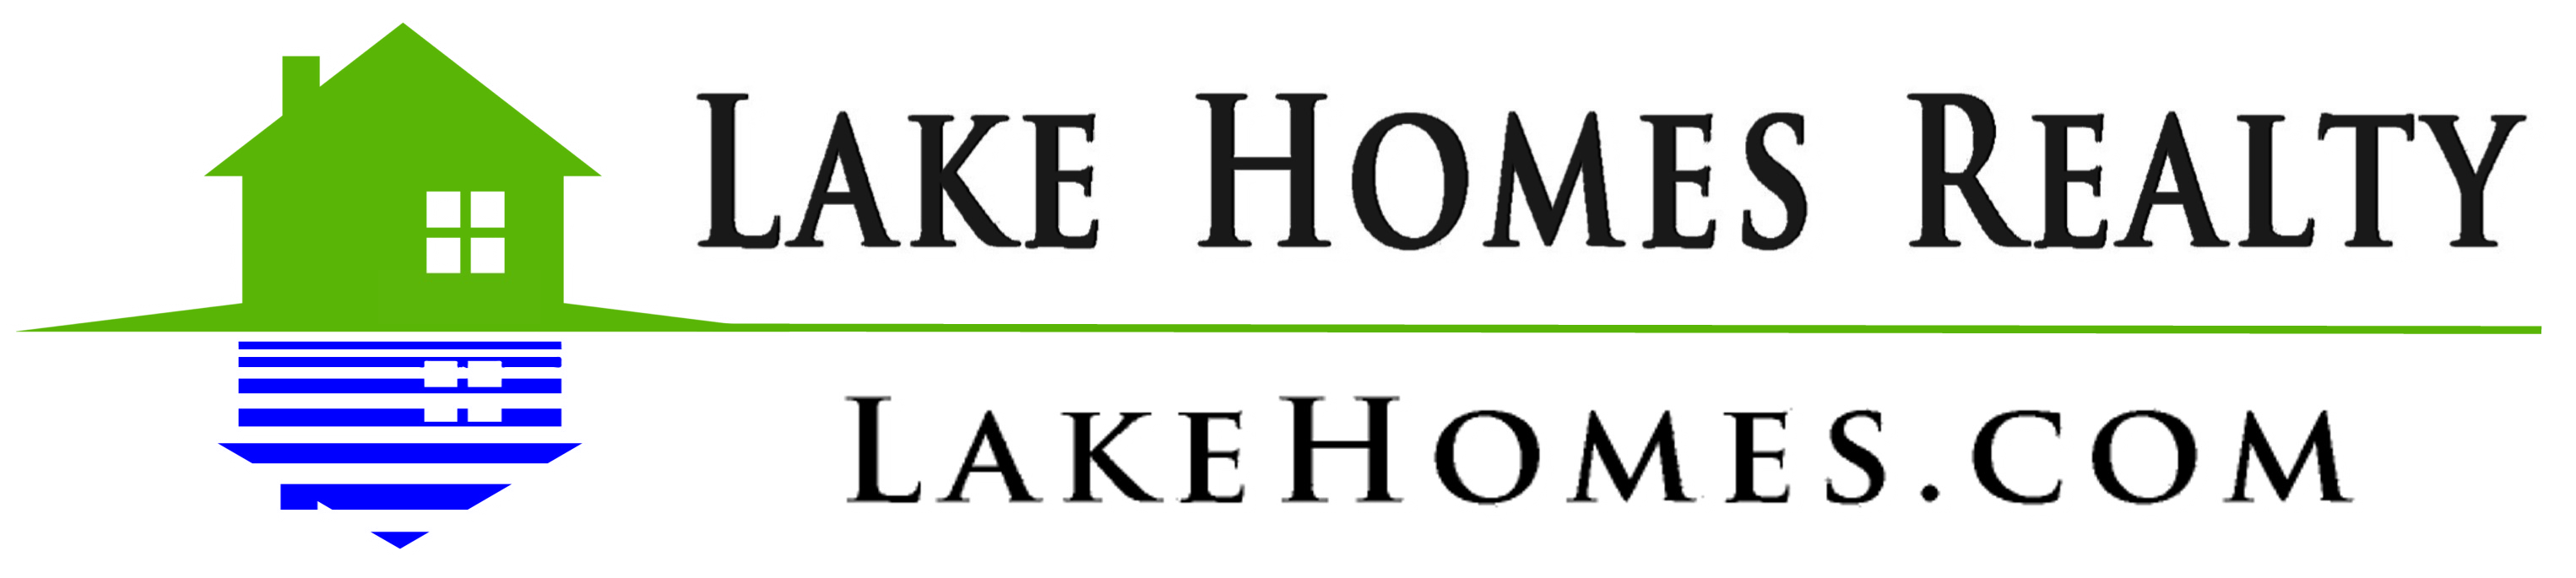 Lake Homes Realty – Sonia Mendez